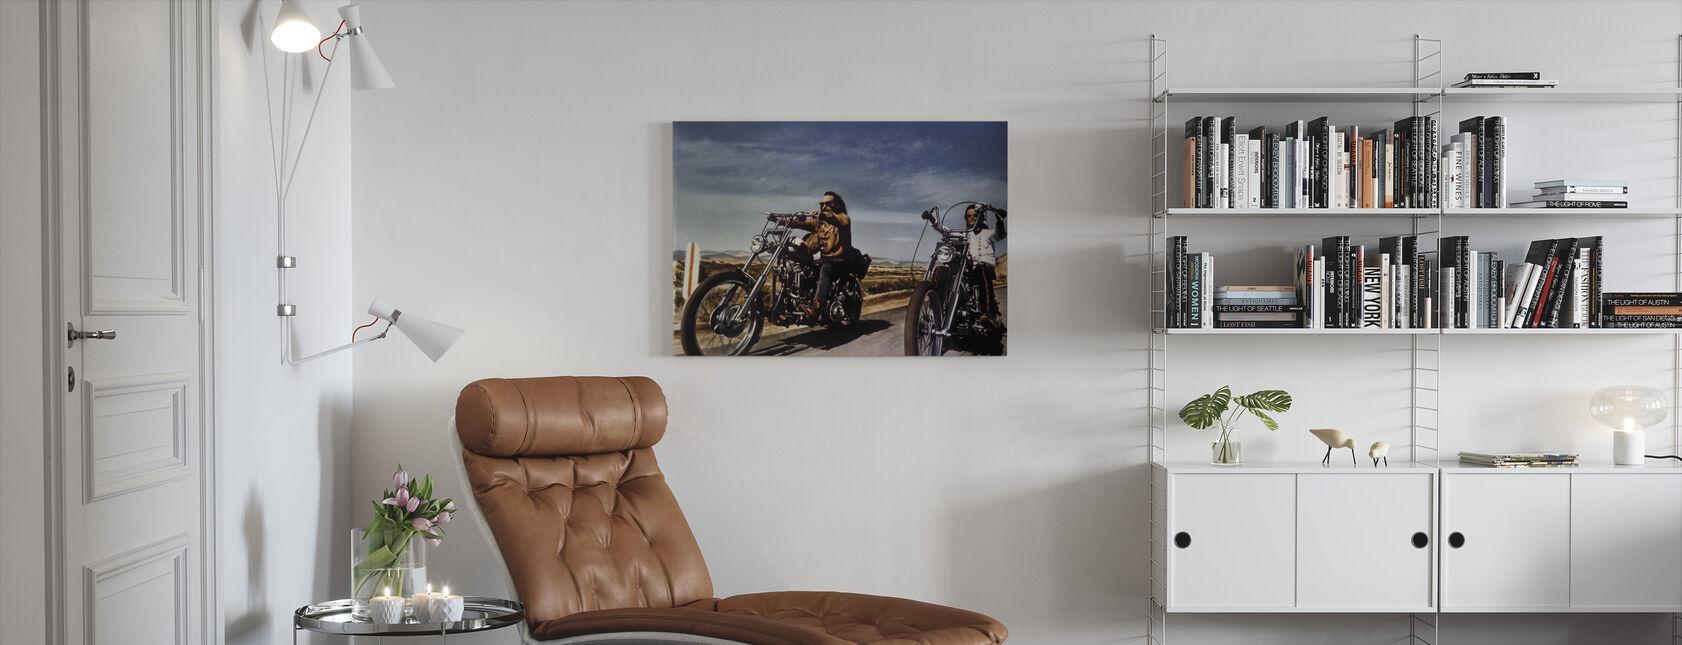 Dennis Hopper et Peter Fonda dans Easy Rider - Impression sur toile - Salle à manger